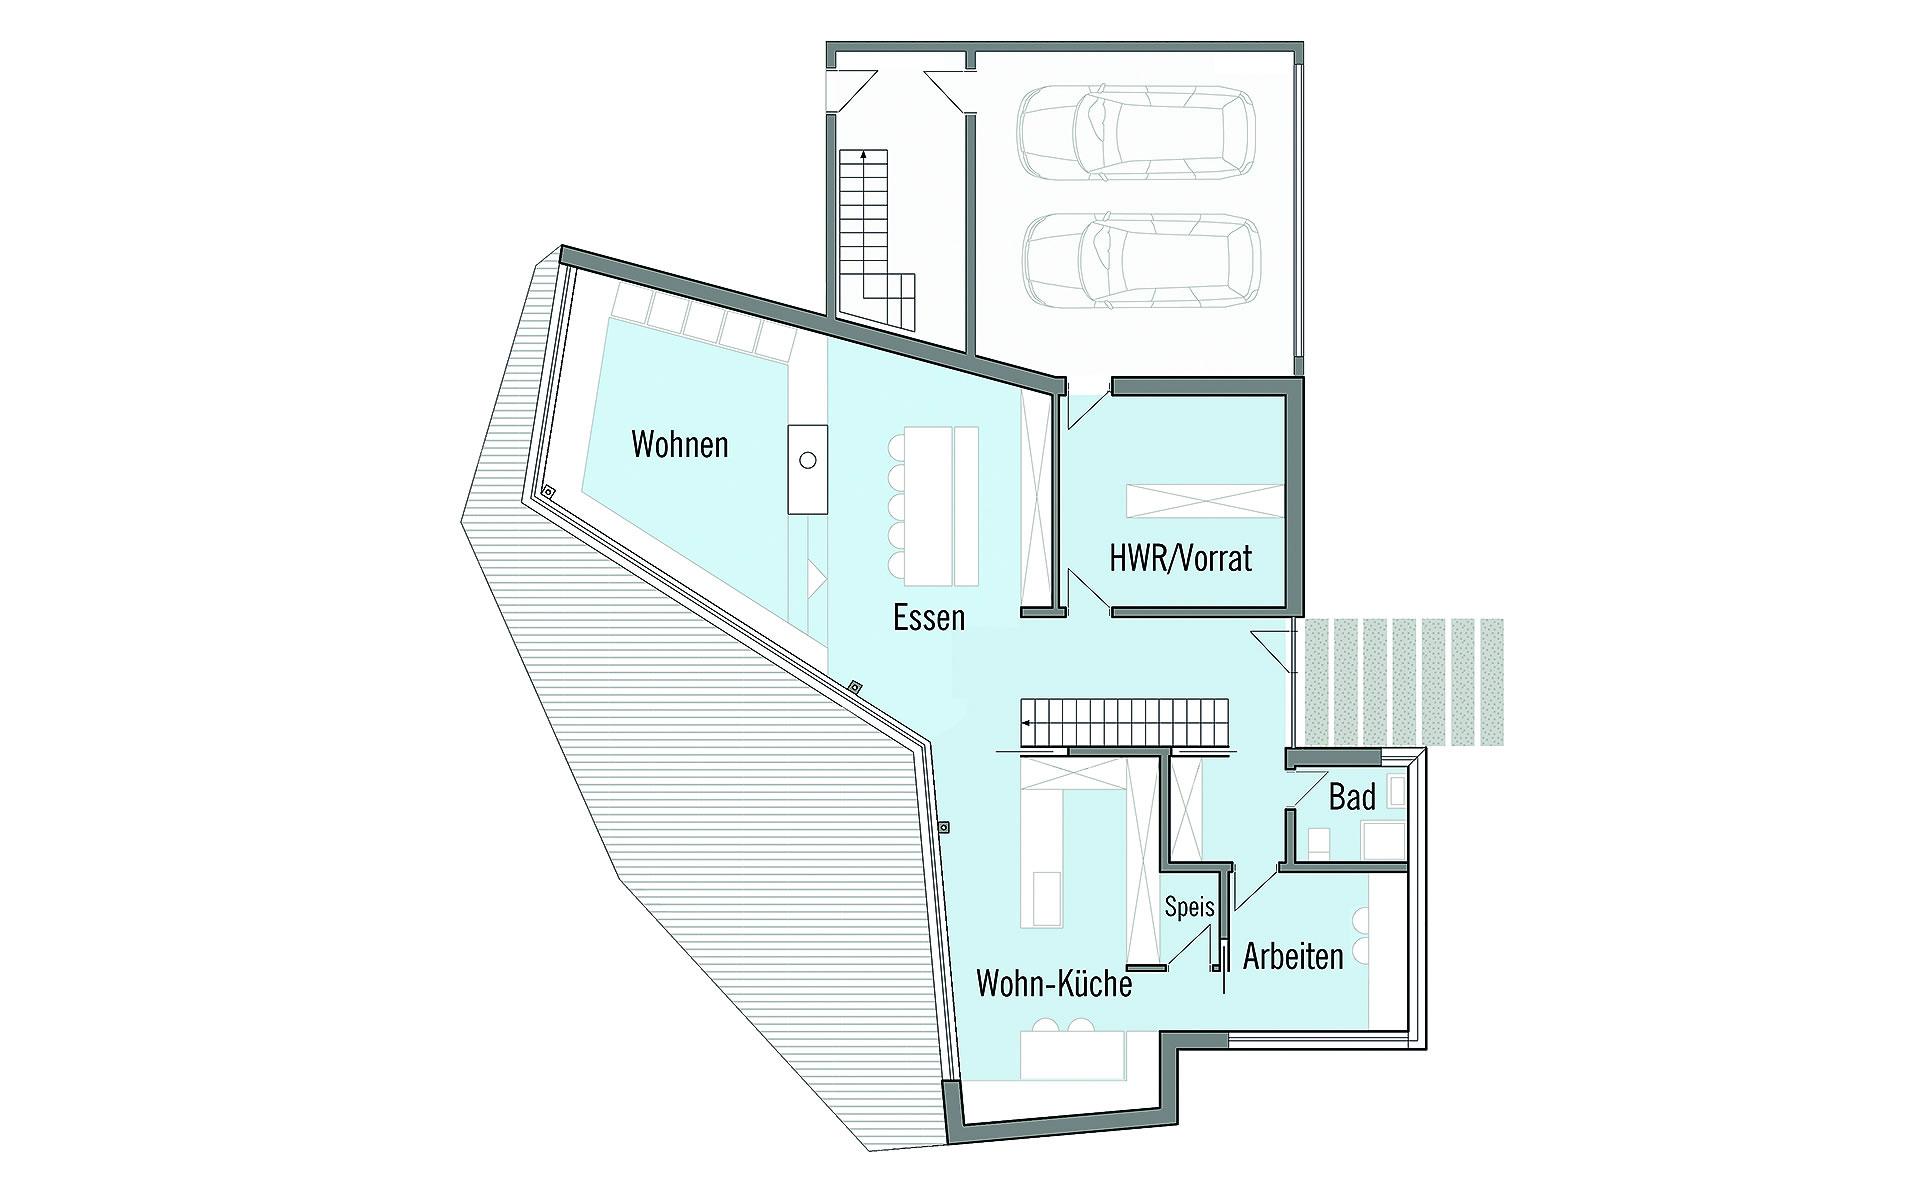 Erdgeschoss Bullinger von Bau-Fritz GmbH & Co. KG, seit 1896